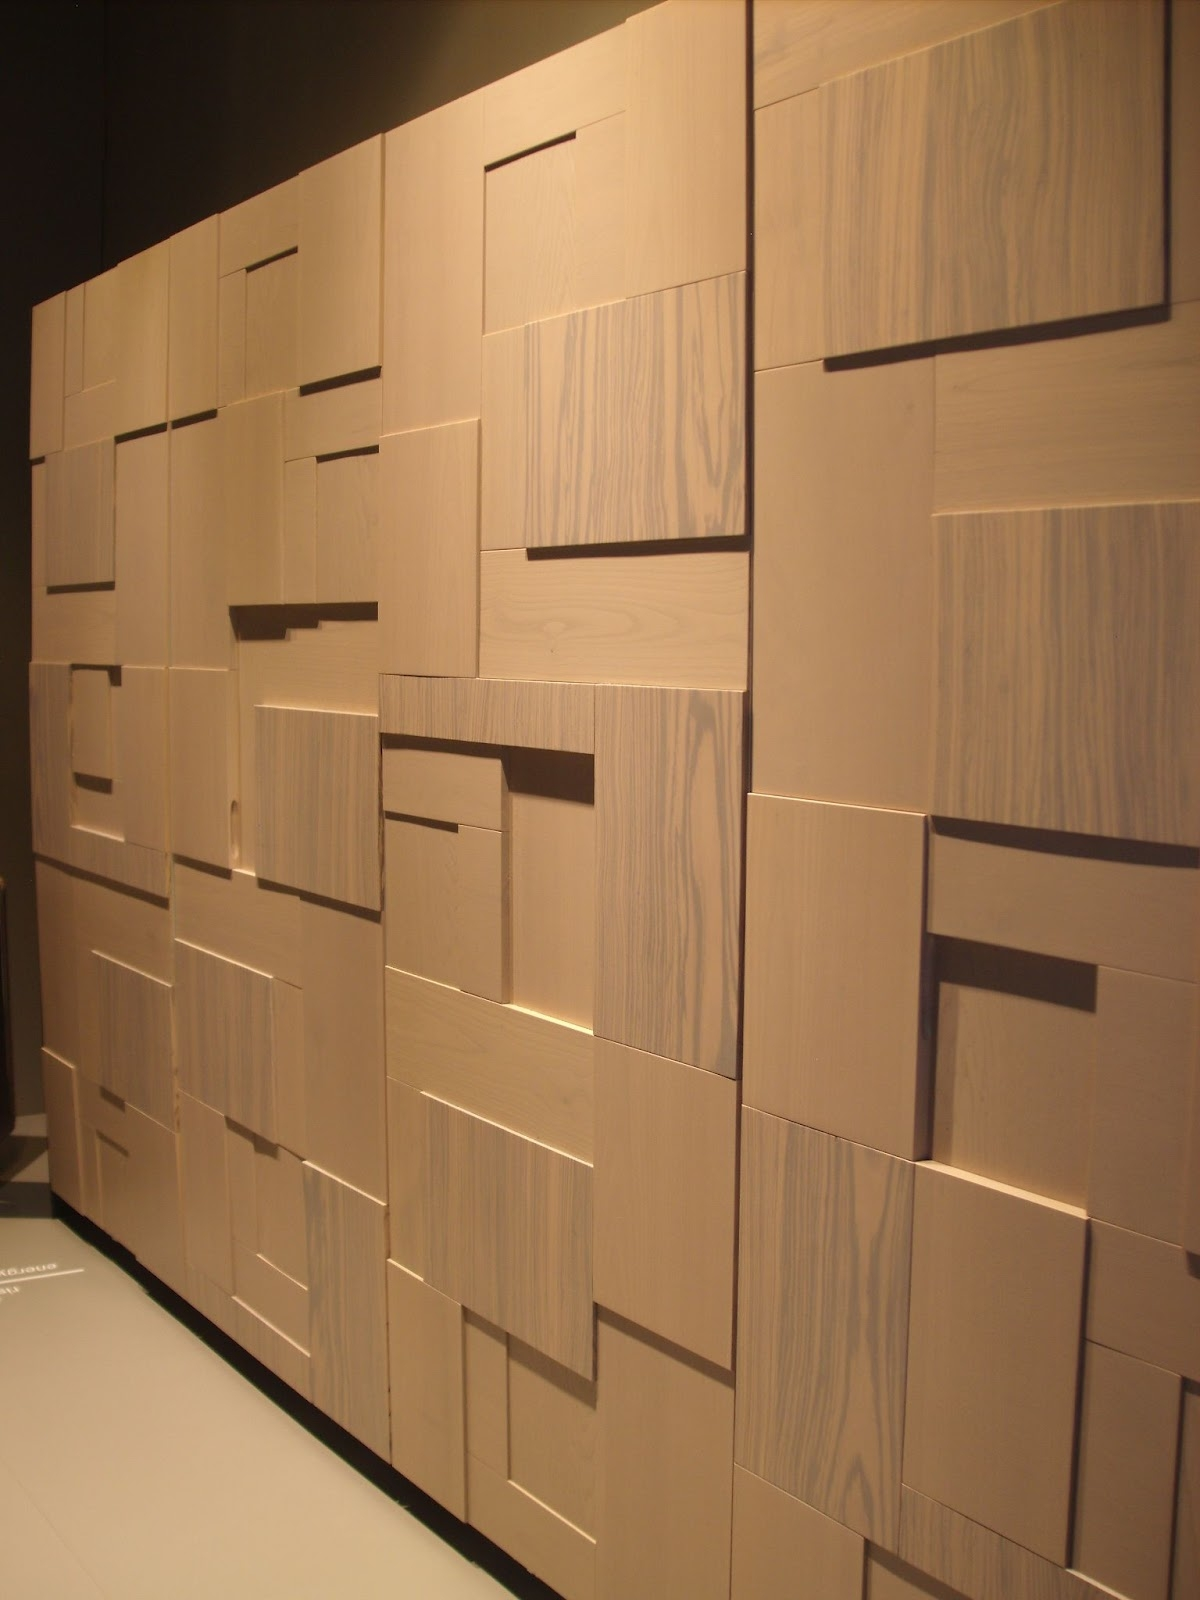 Hidden Sliding Cabinet Door Hardwaresliding door hardware for kitchen cabinets inspirative cabinet